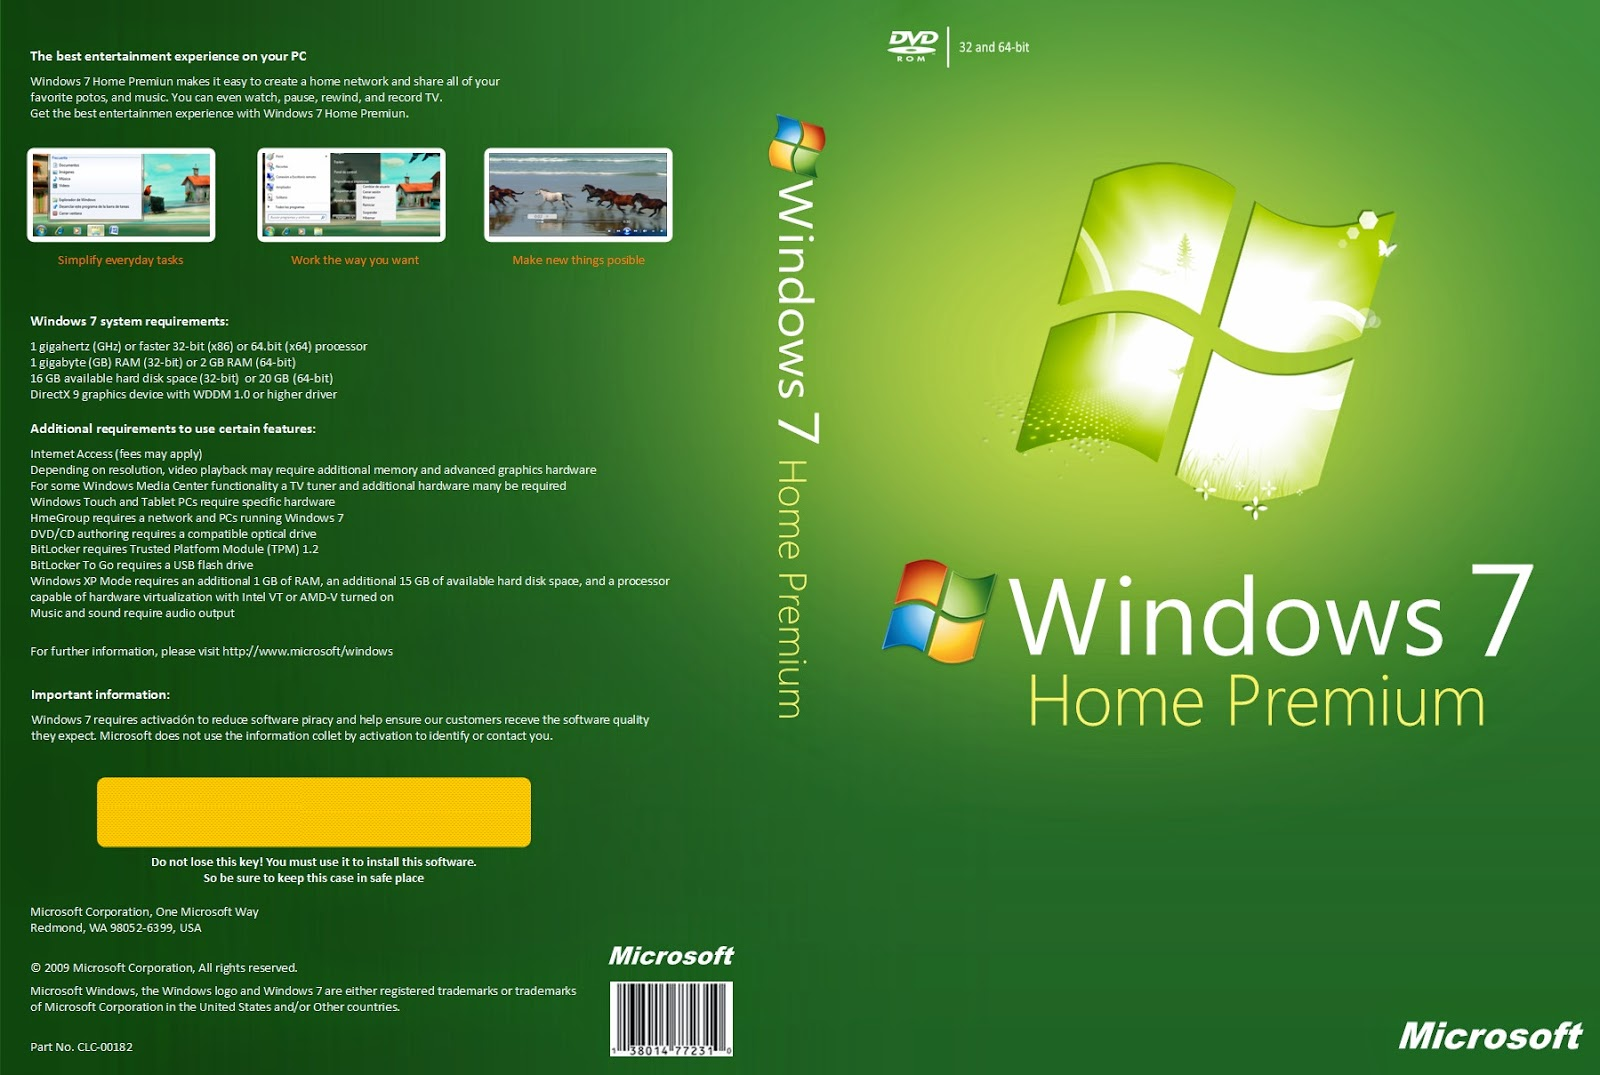 free download windows 7 professional 32 bit service pack 1